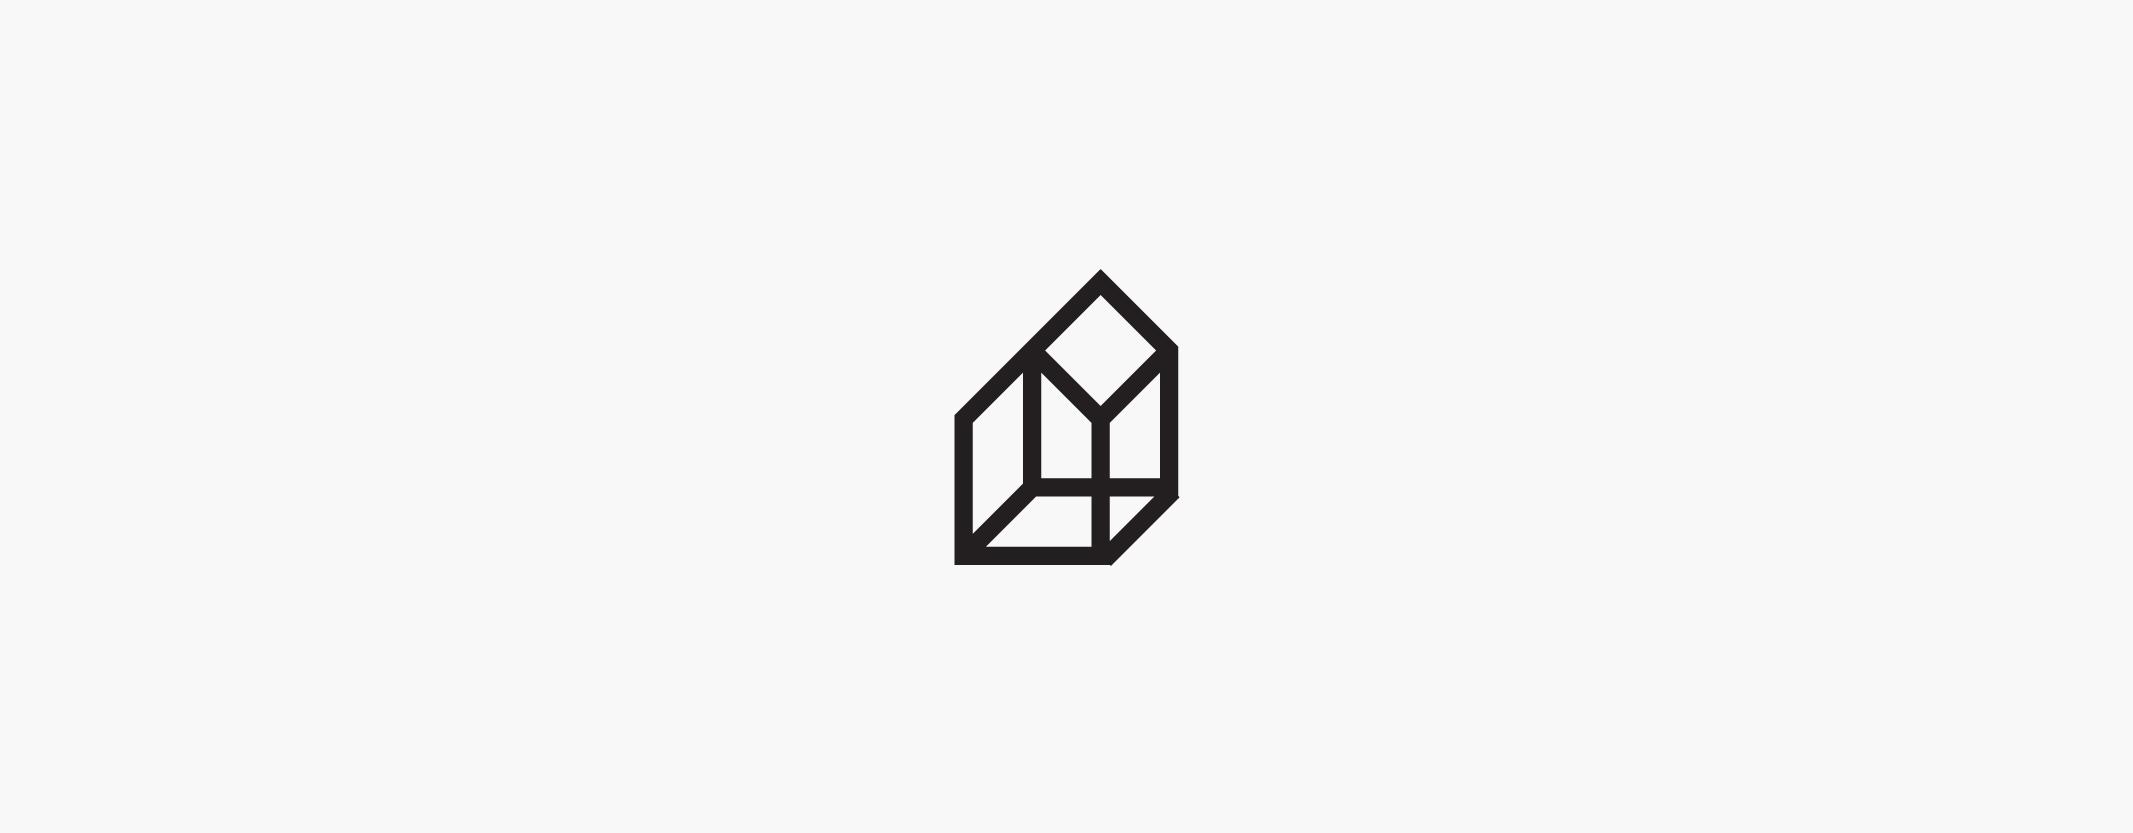 15_logos_house